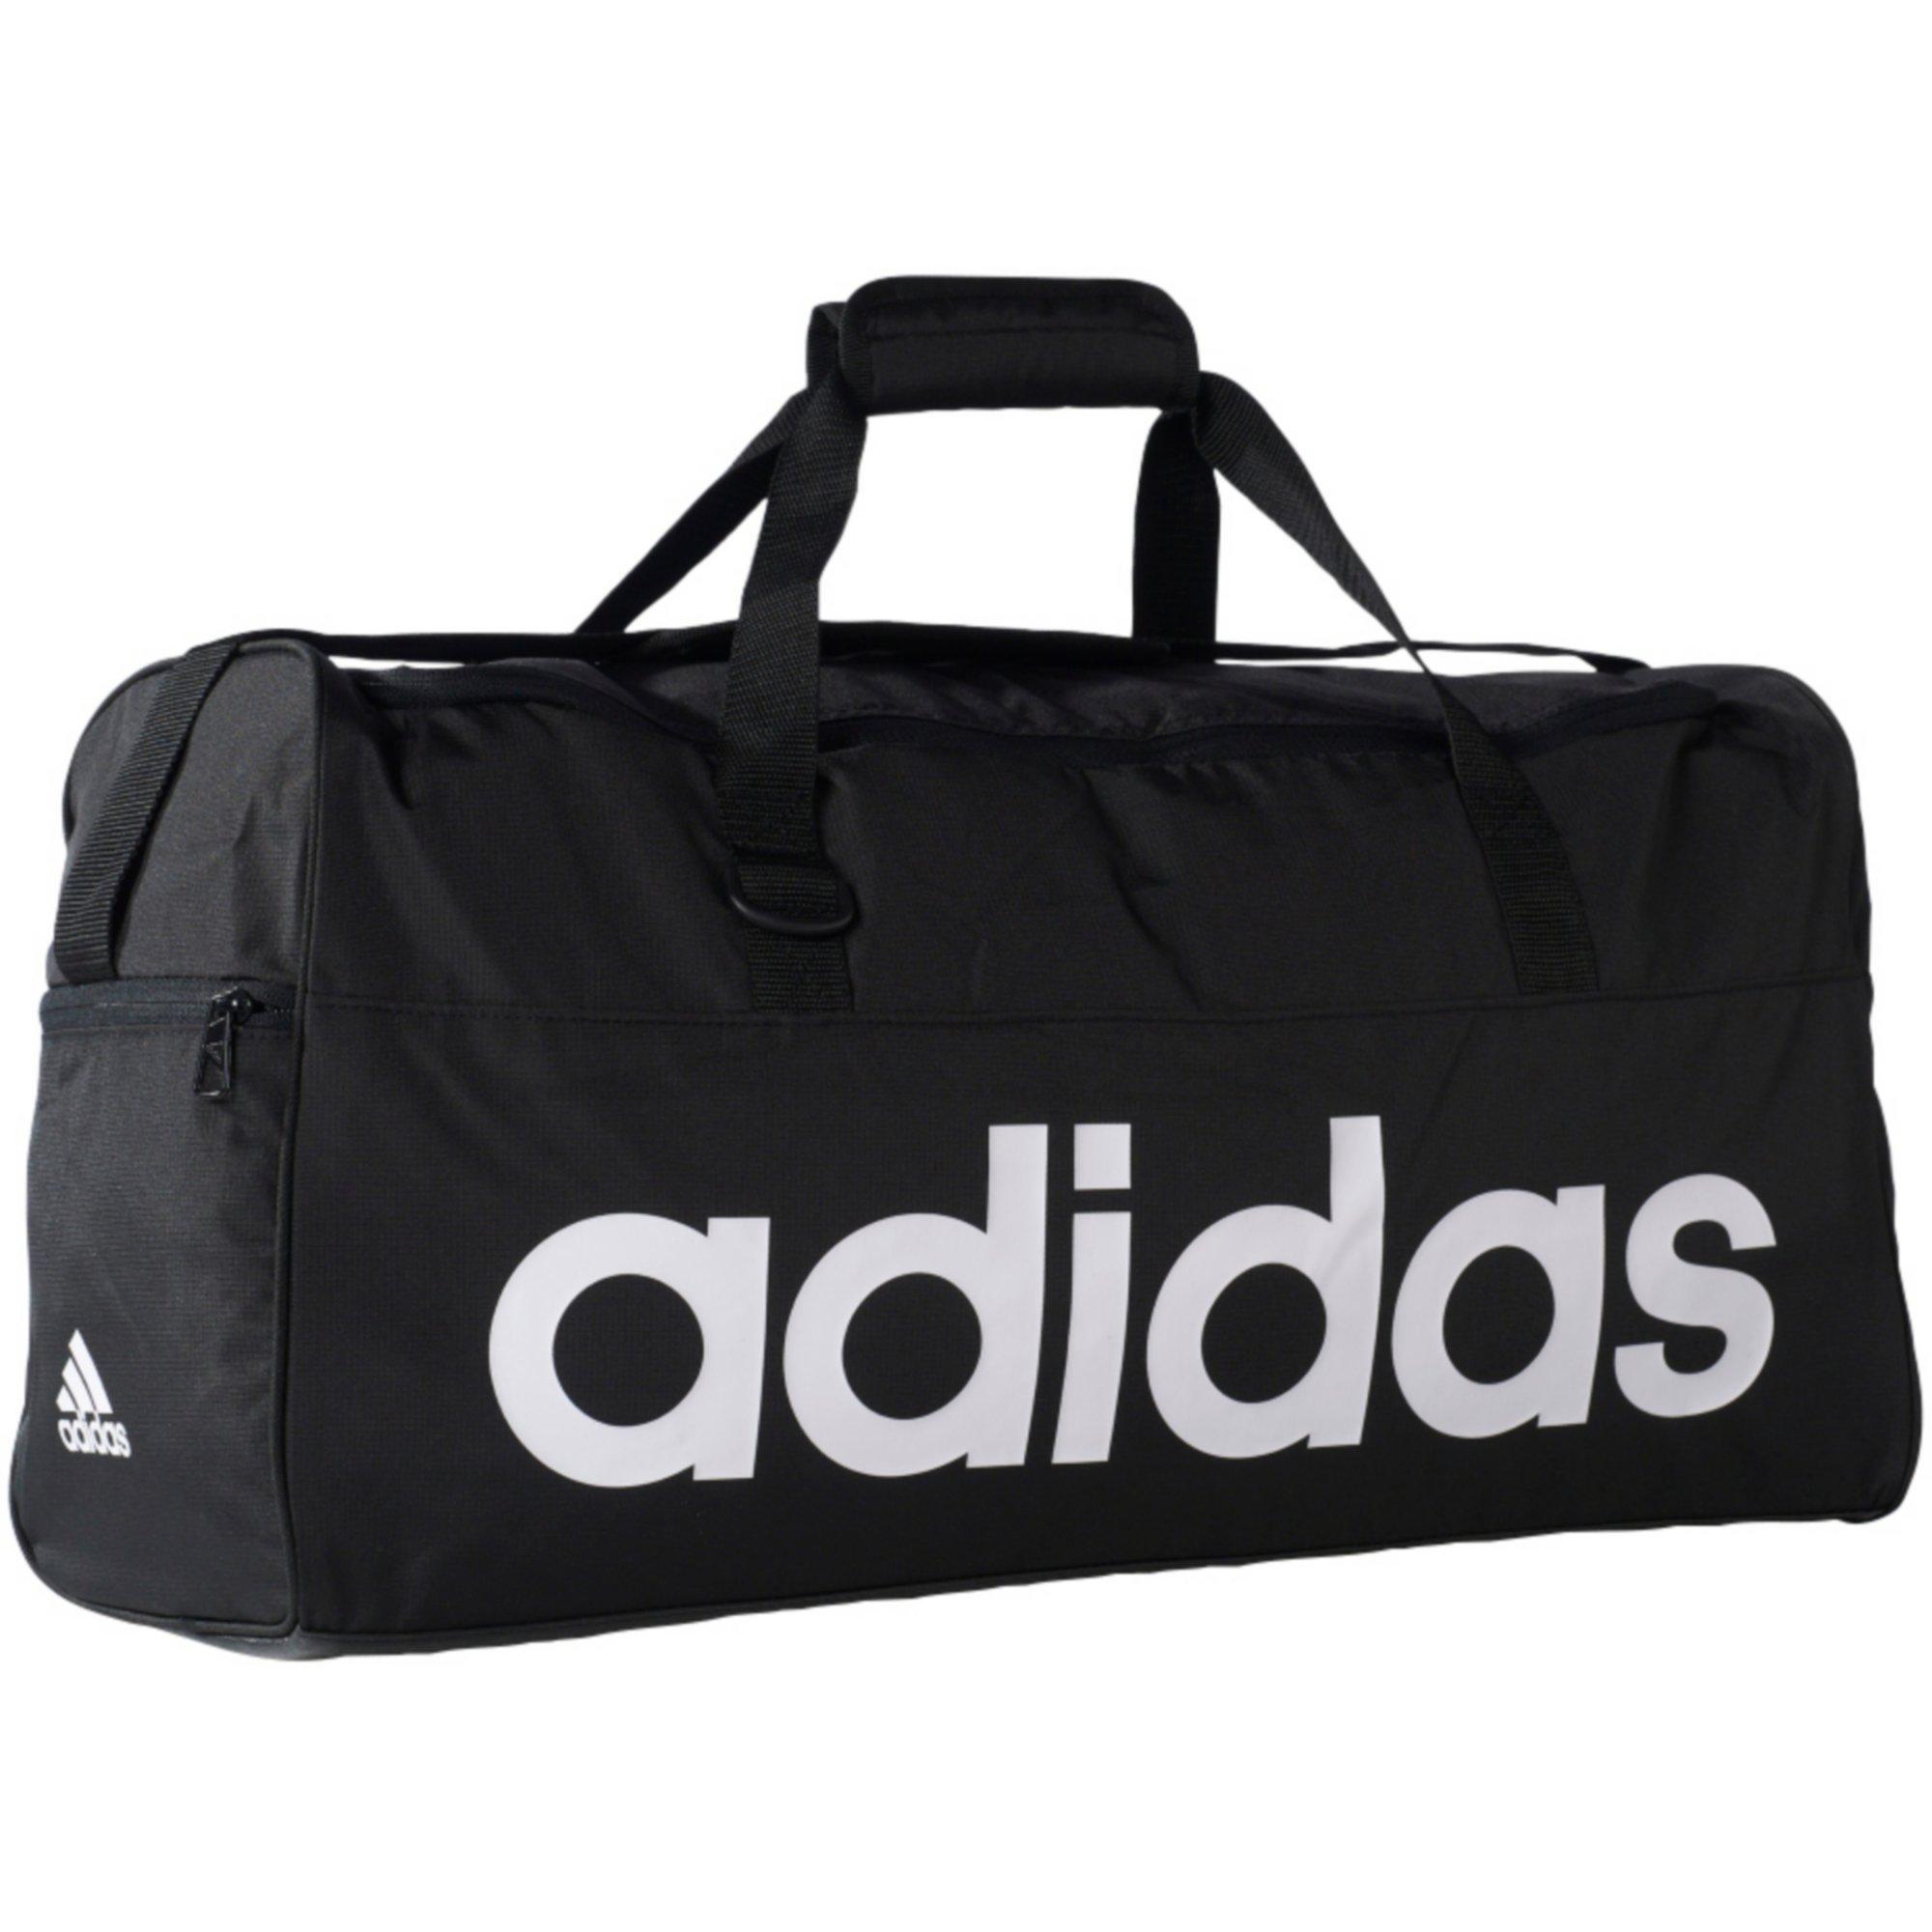 adidas c sac roulettes team travel grand format catgorie produits drivs sport. Black Bedroom Furniture Sets. Home Design Ideas